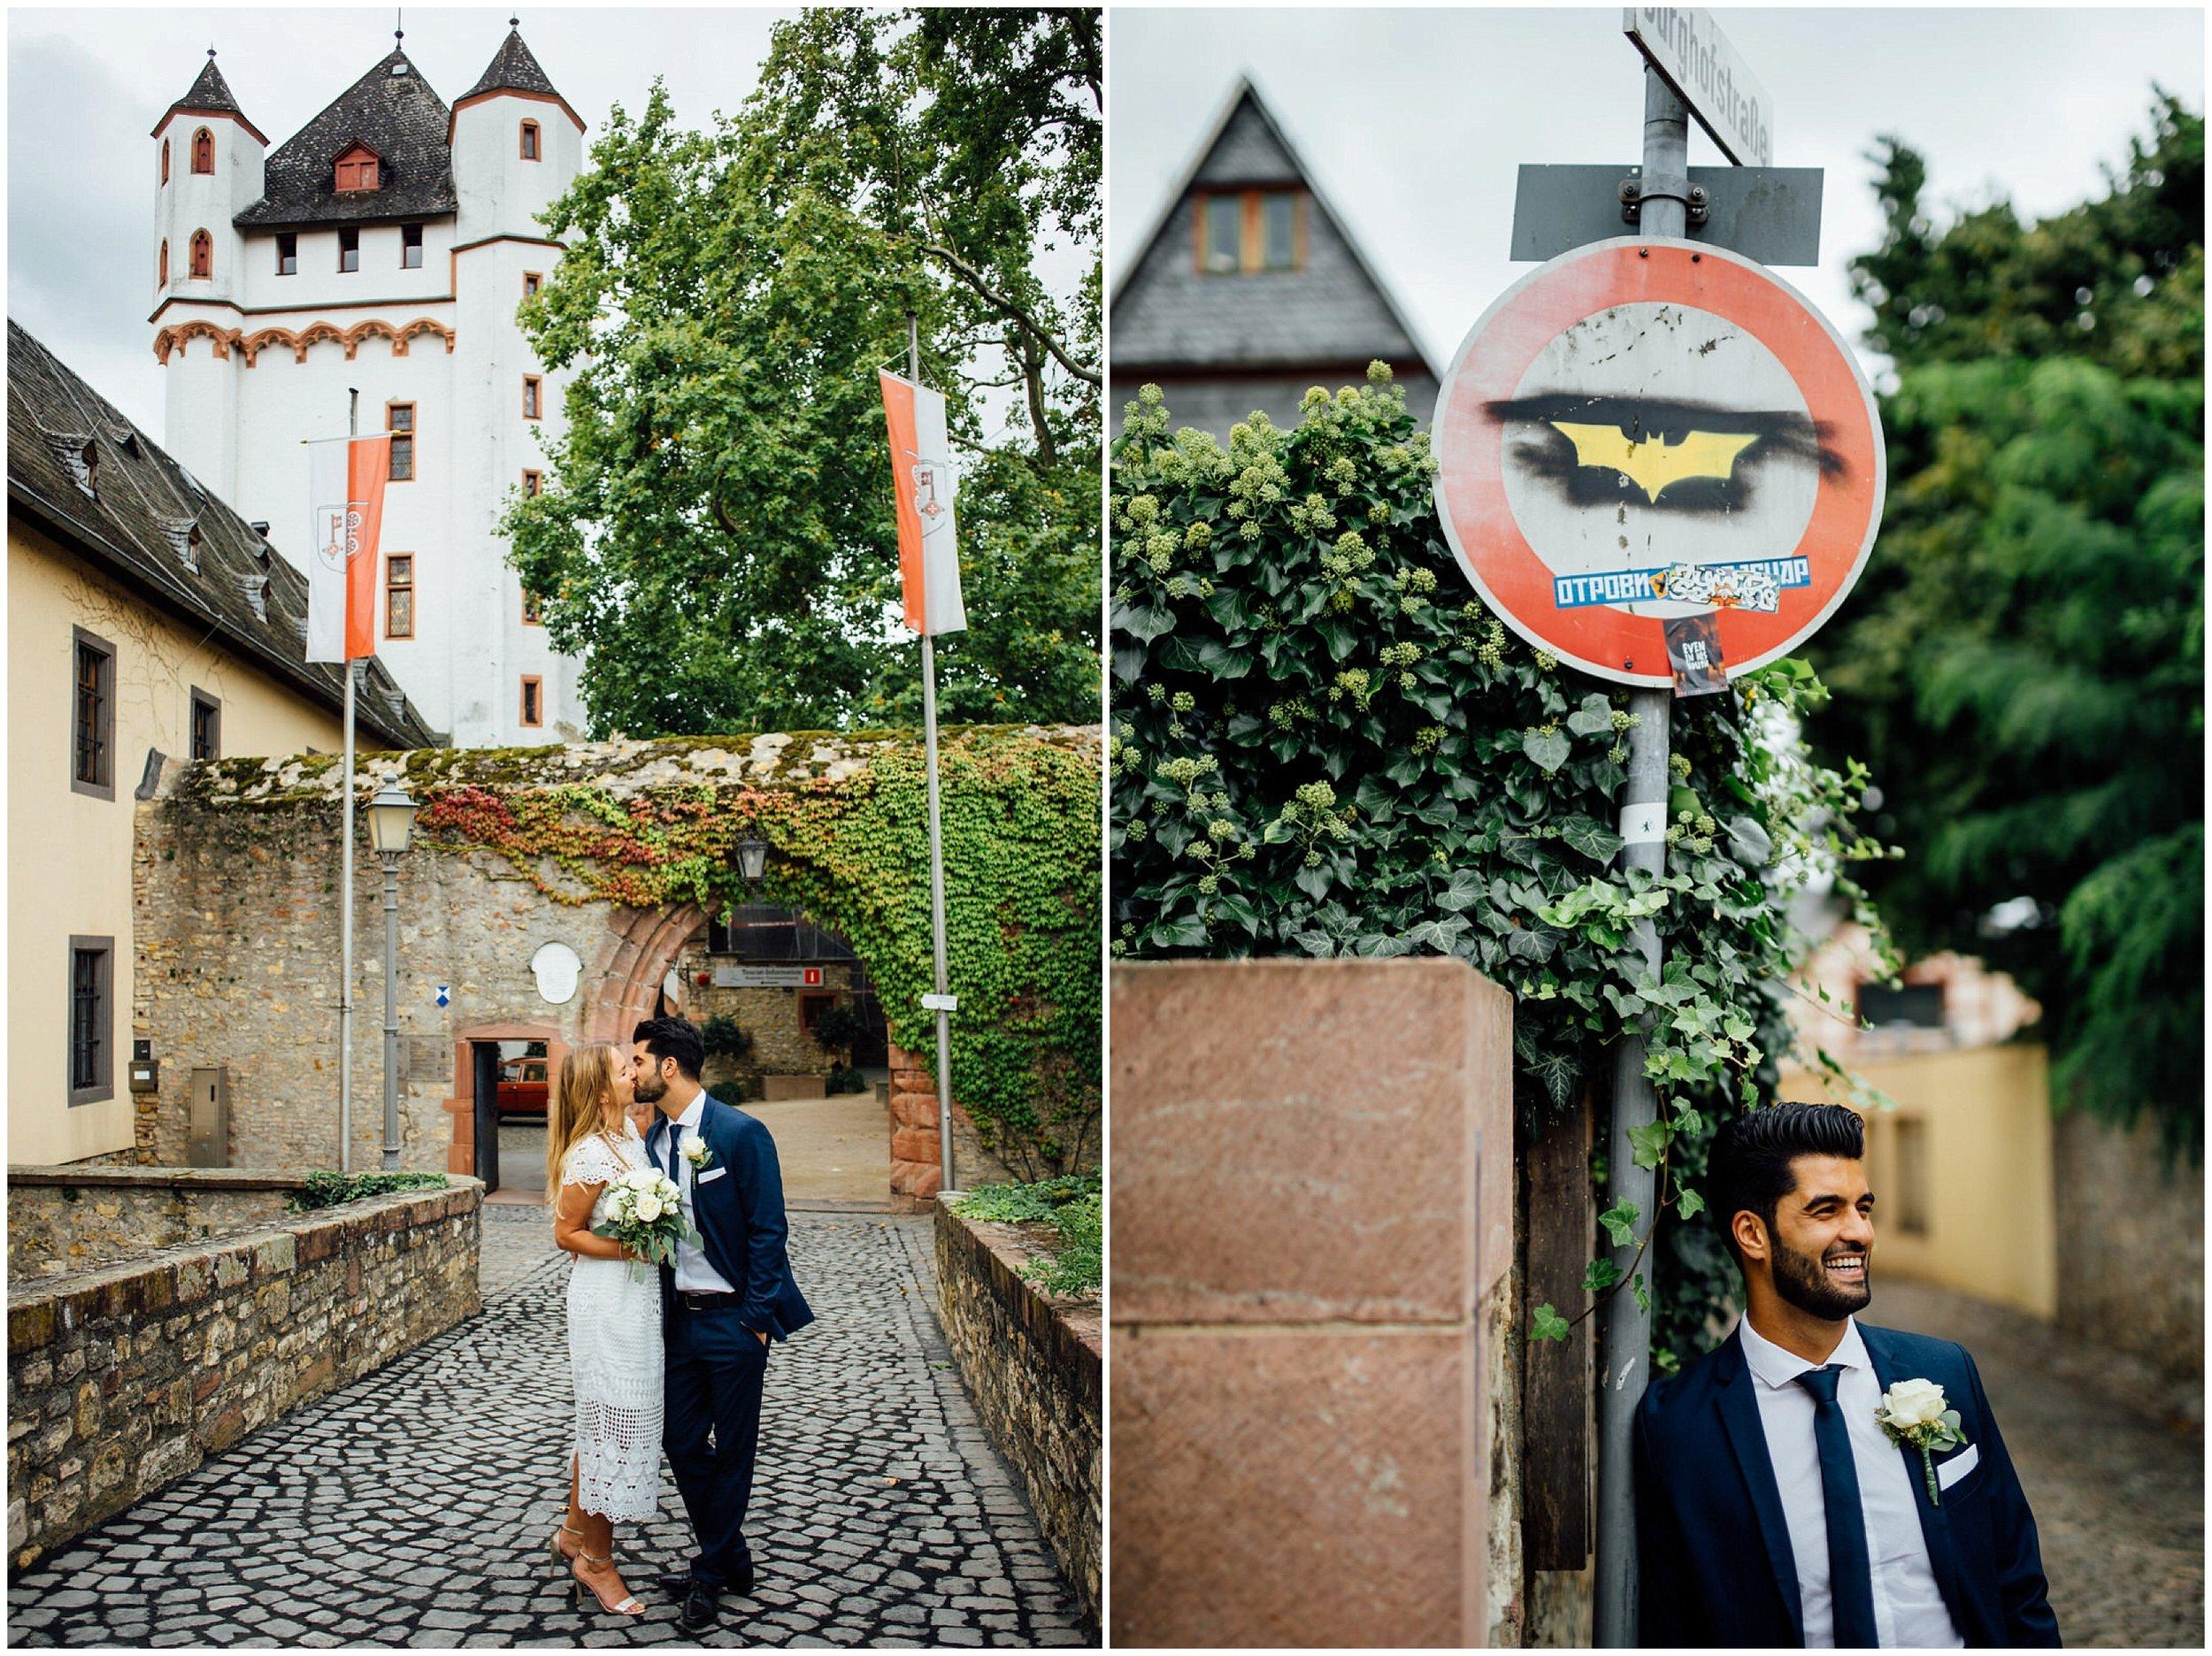 Paul_Traeger_Hochzeitsfotograf_Thueringen_Erfurt_Jena_Weimar_100221248.JPG